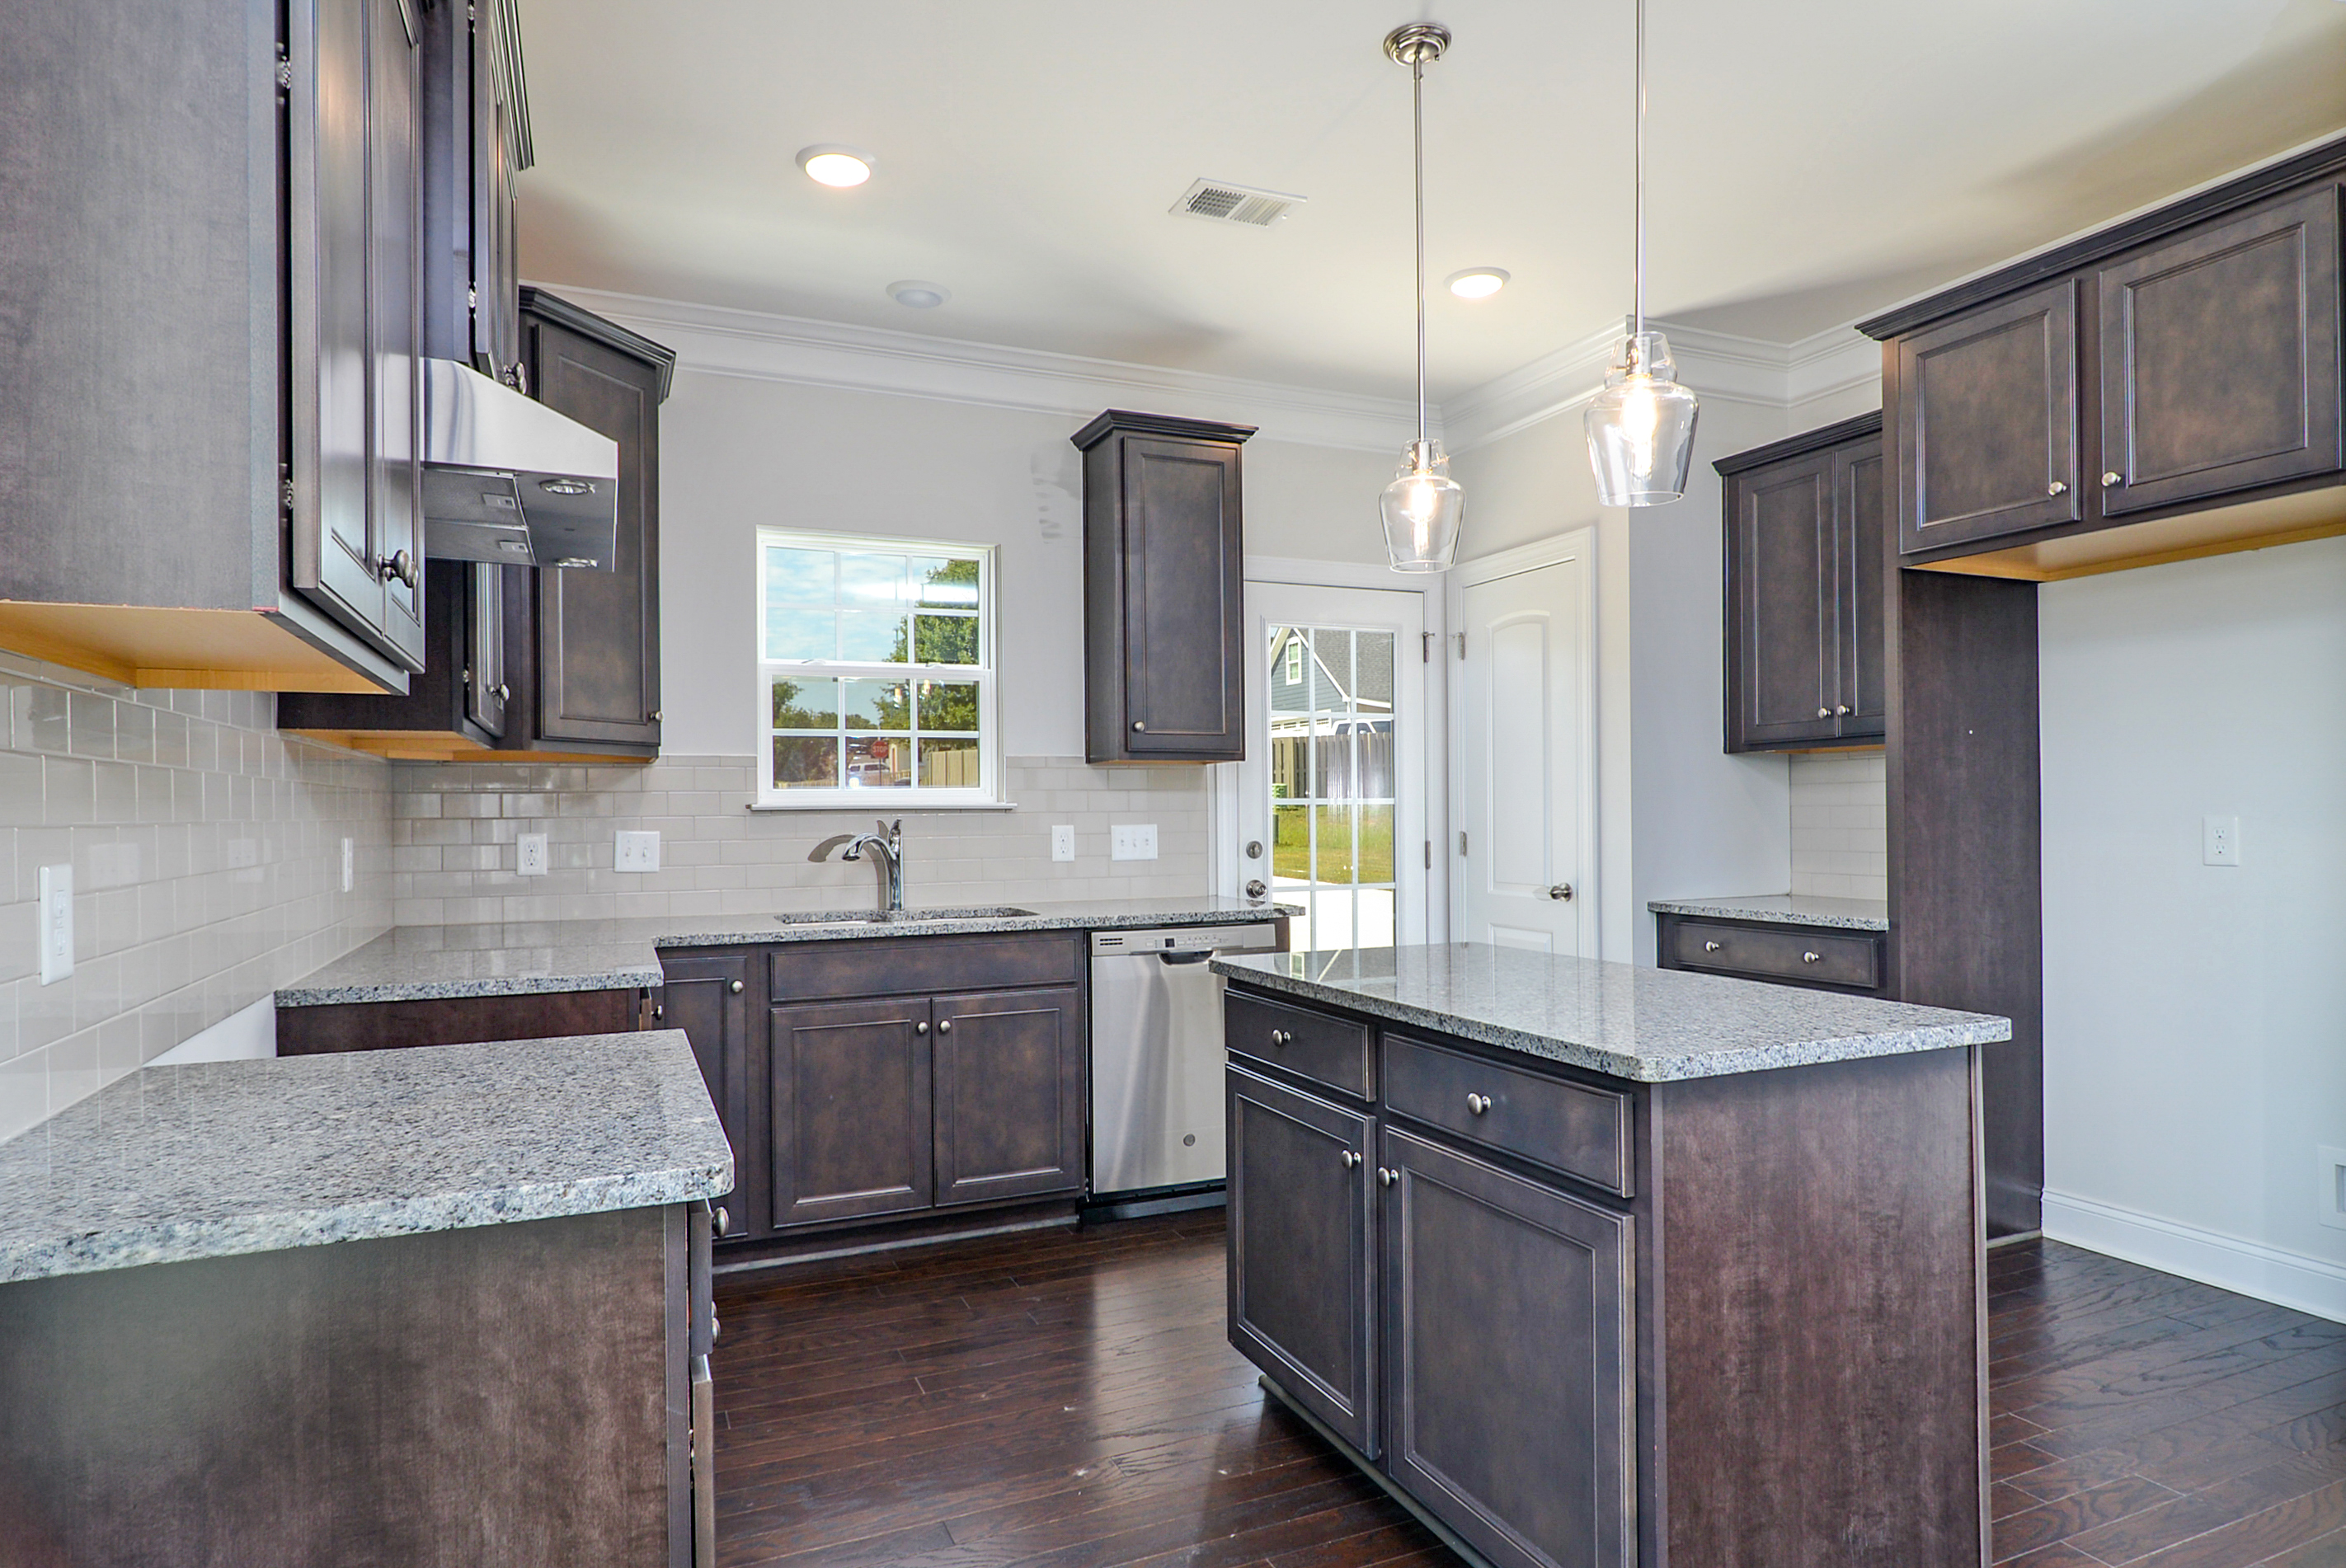 kitchen-1_48716740032_o.jpg